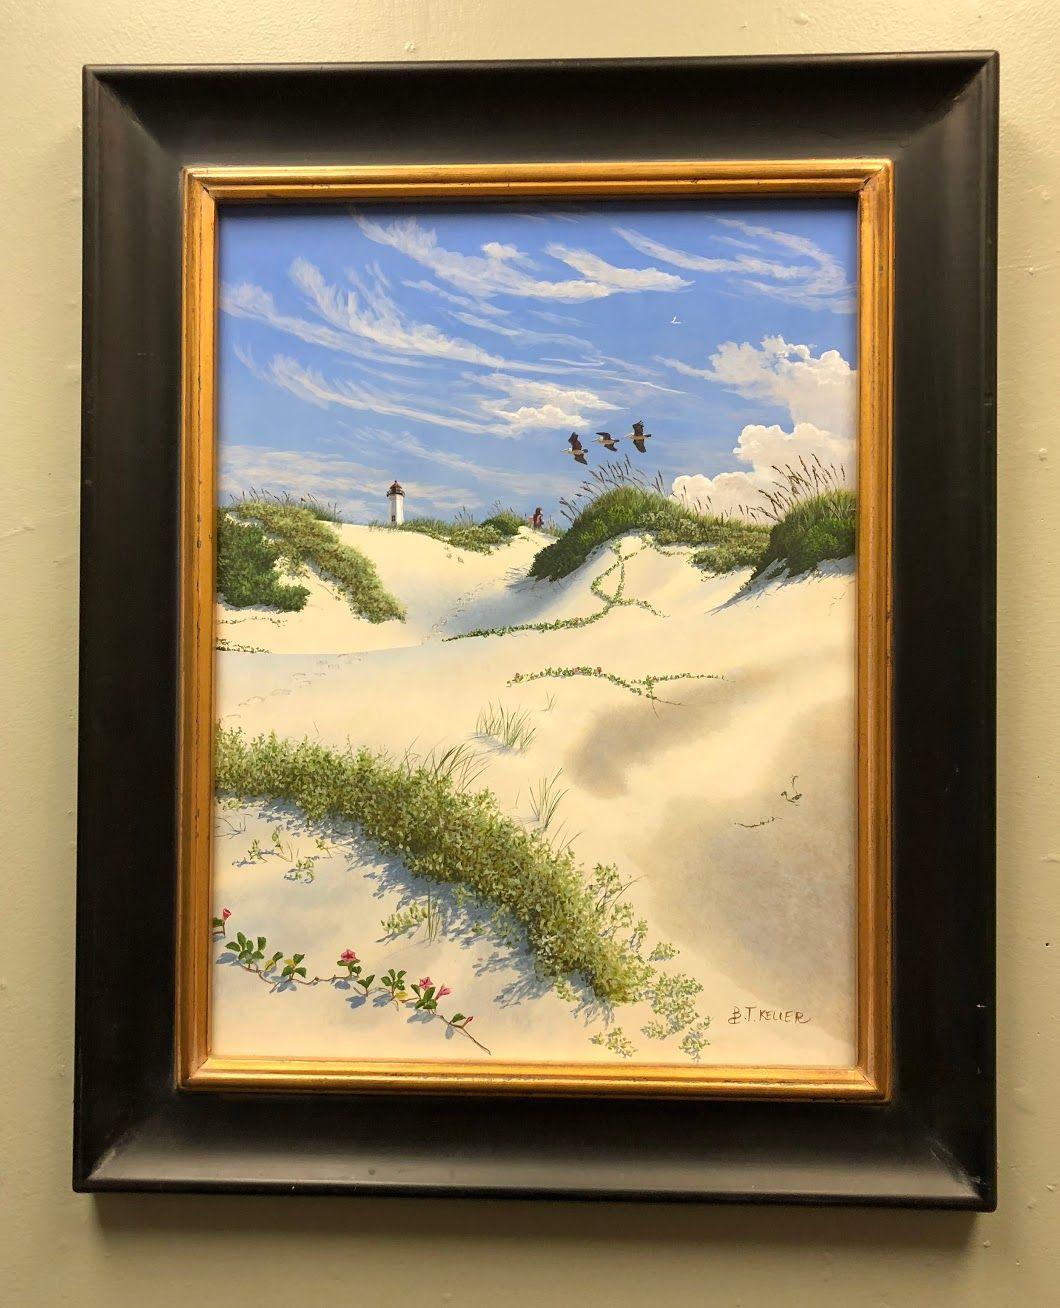 Brian Keller Seaside Painting Bonrics Custom Framing and Gallery ...